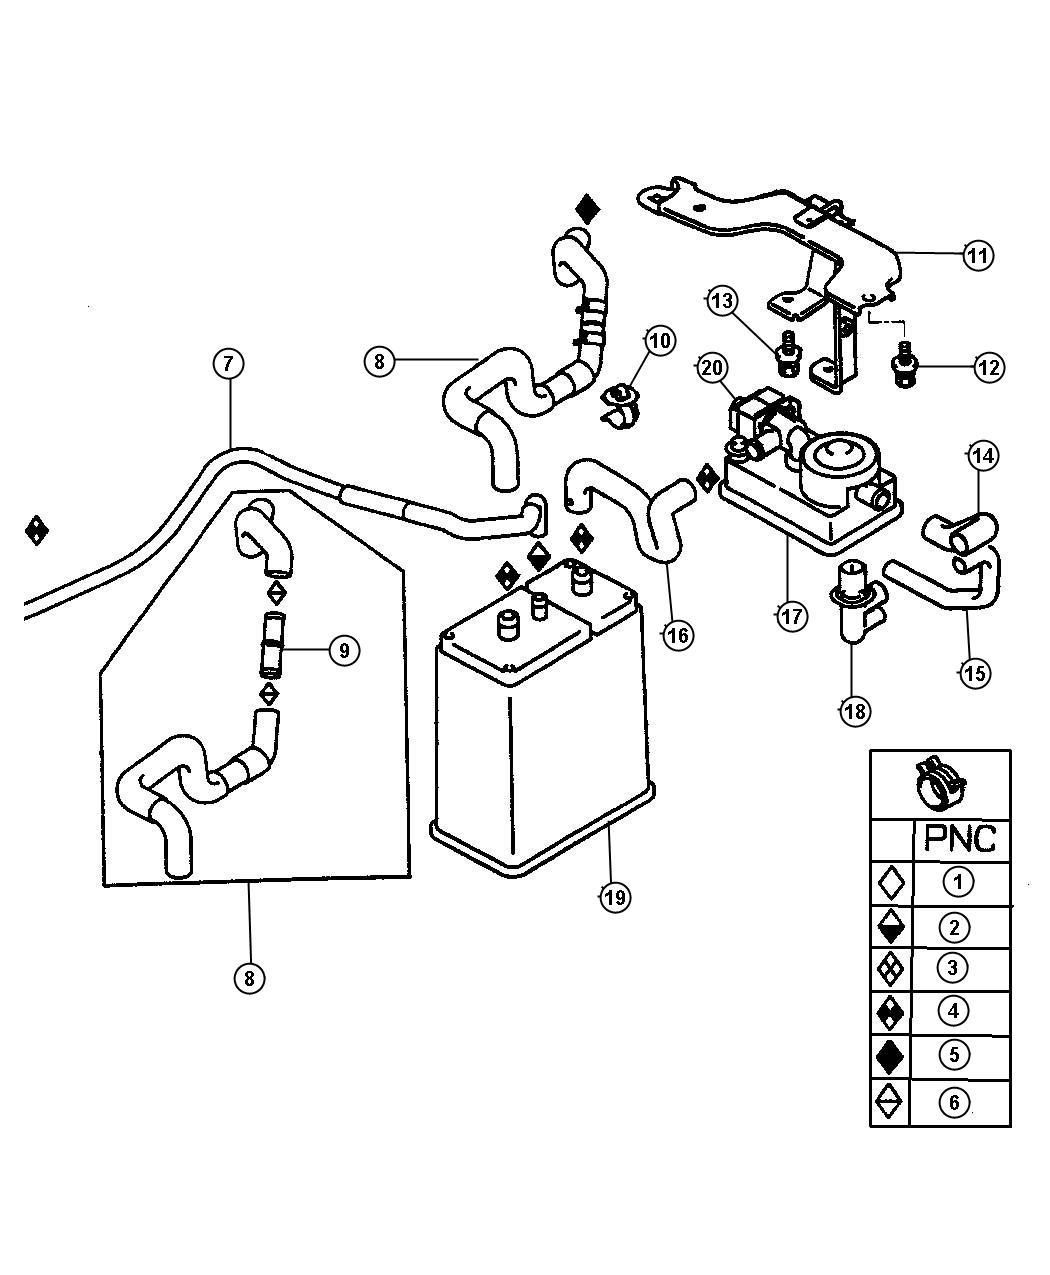 Dodge Stratus Valve. Fuel vapor control check. [lx], [lxi